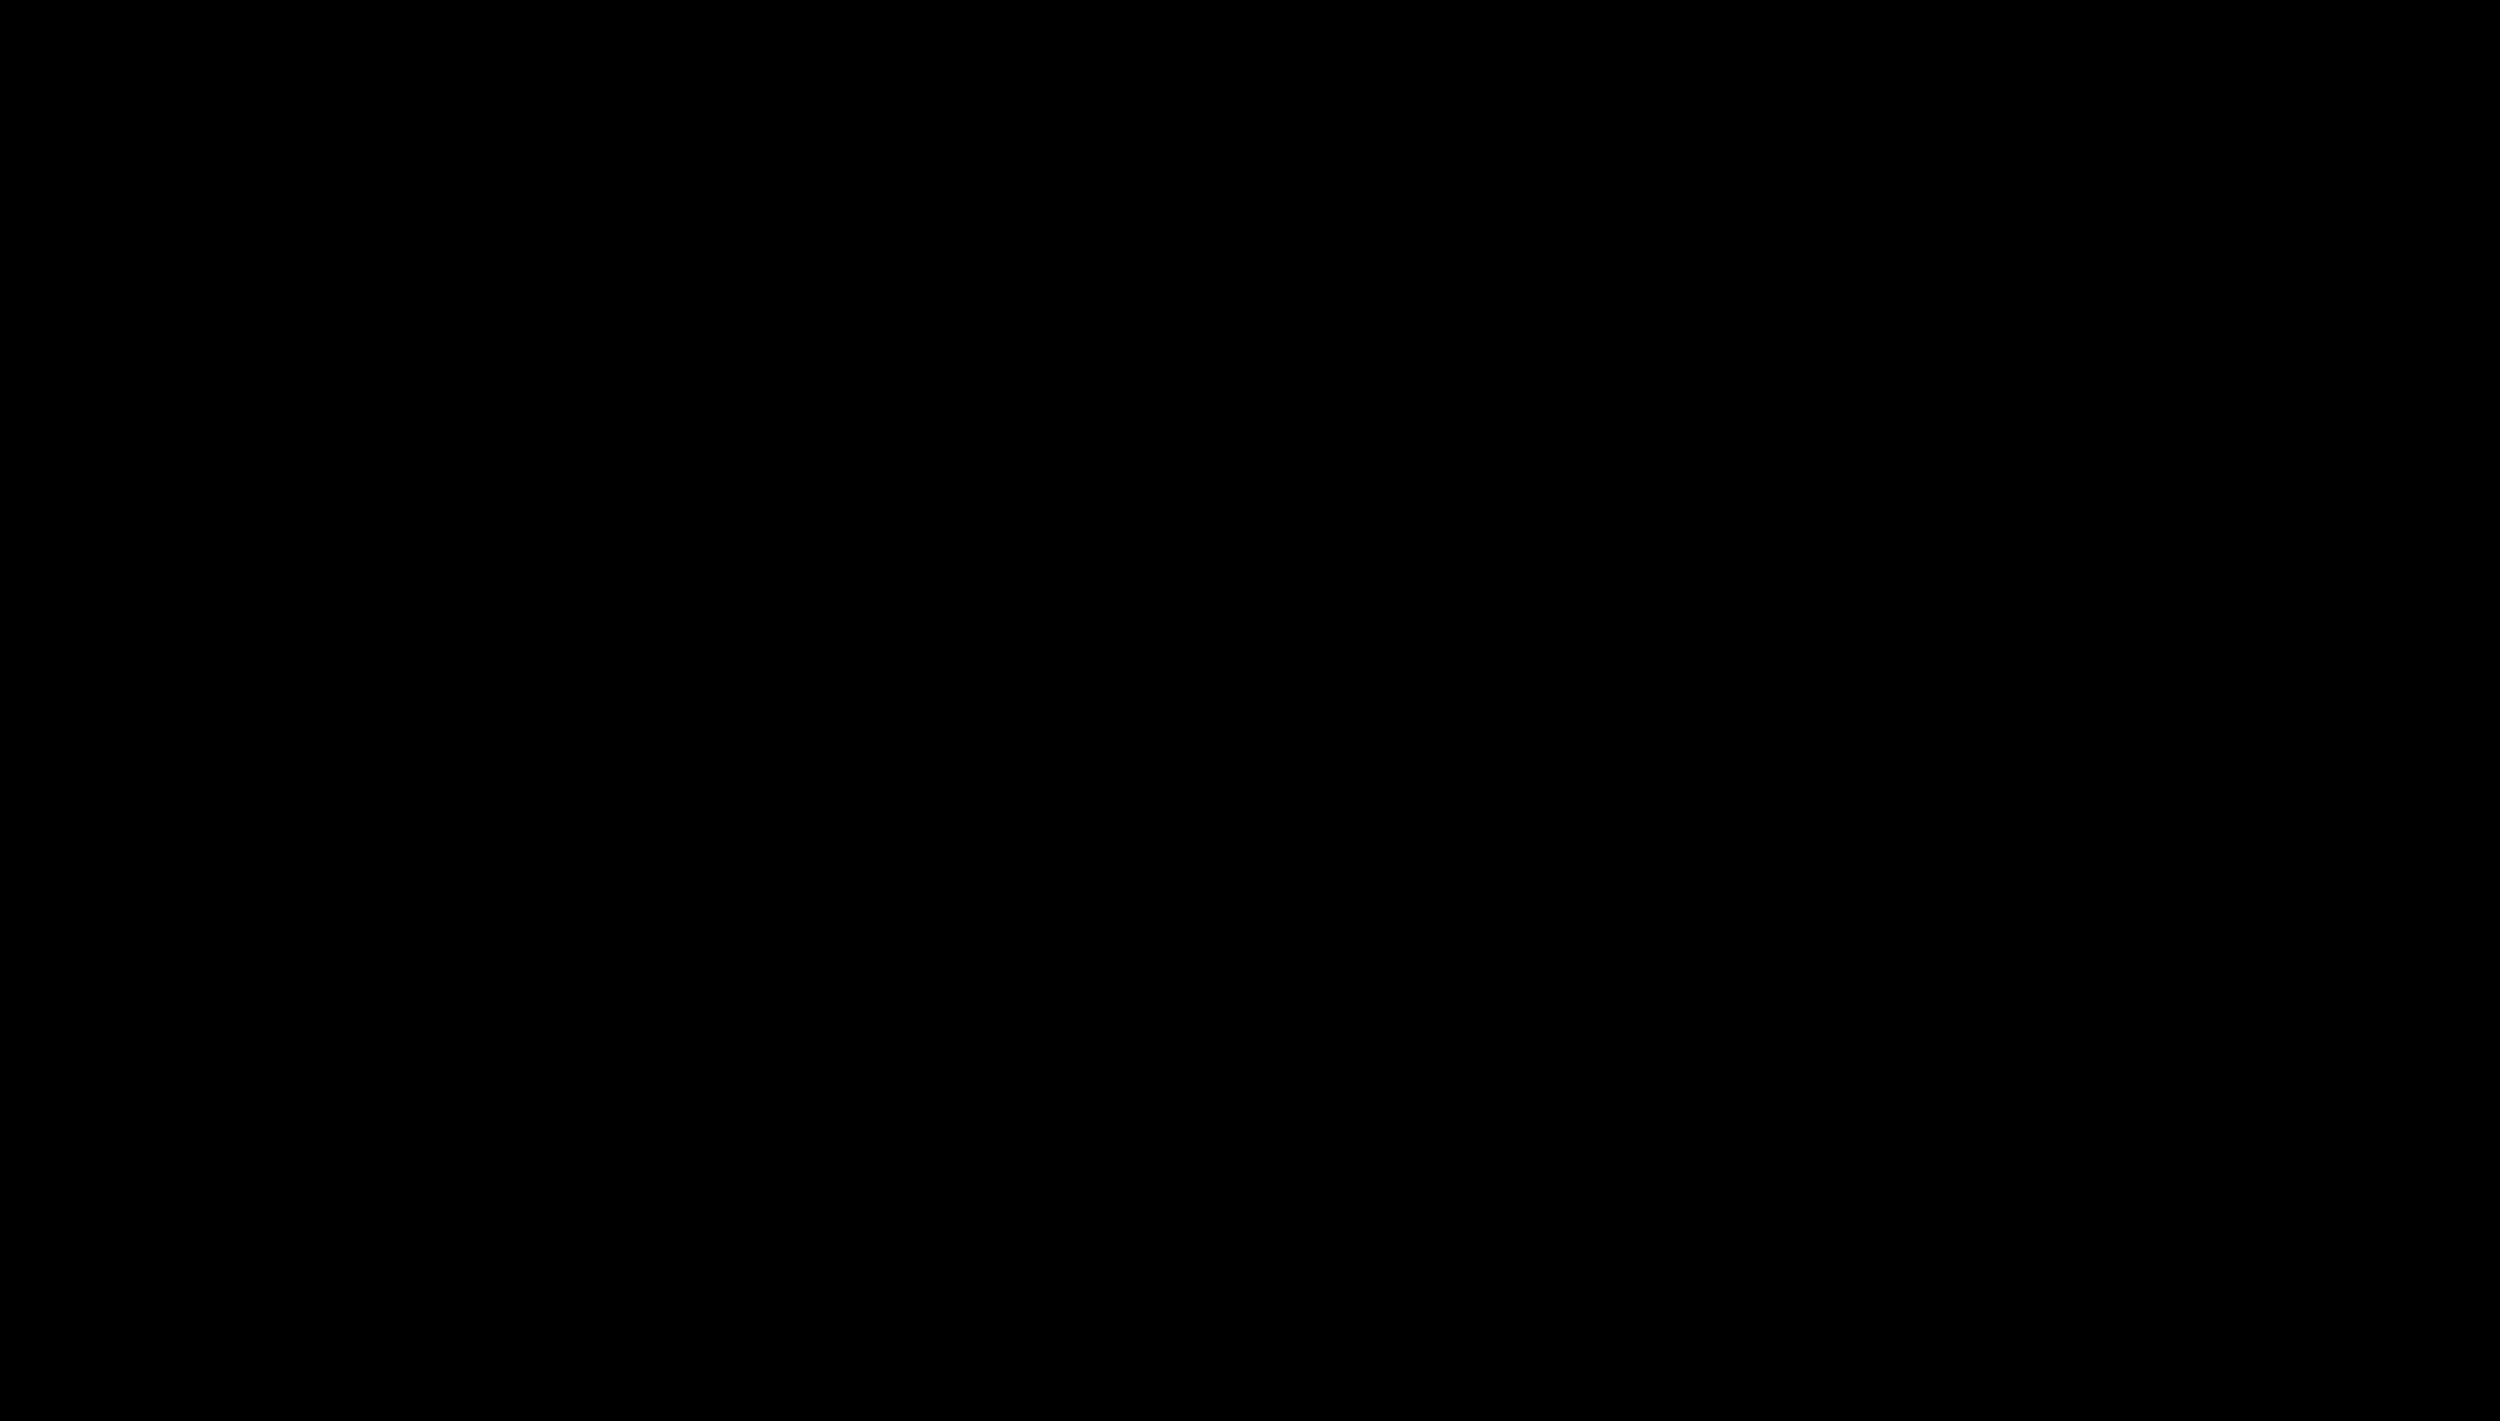 logo duke FINAL-01.png